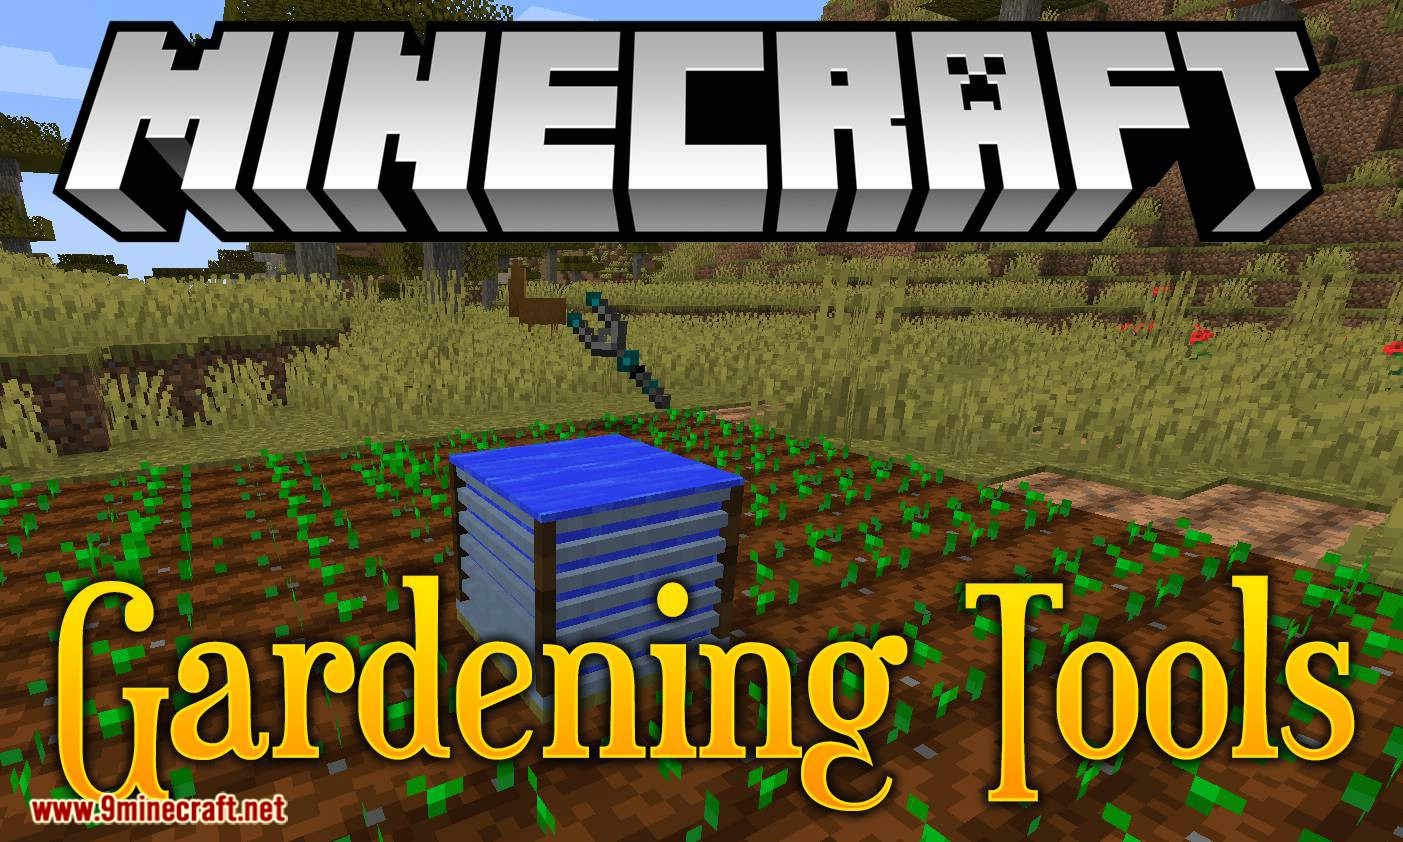 Gardening Tools mod for minecraft logo